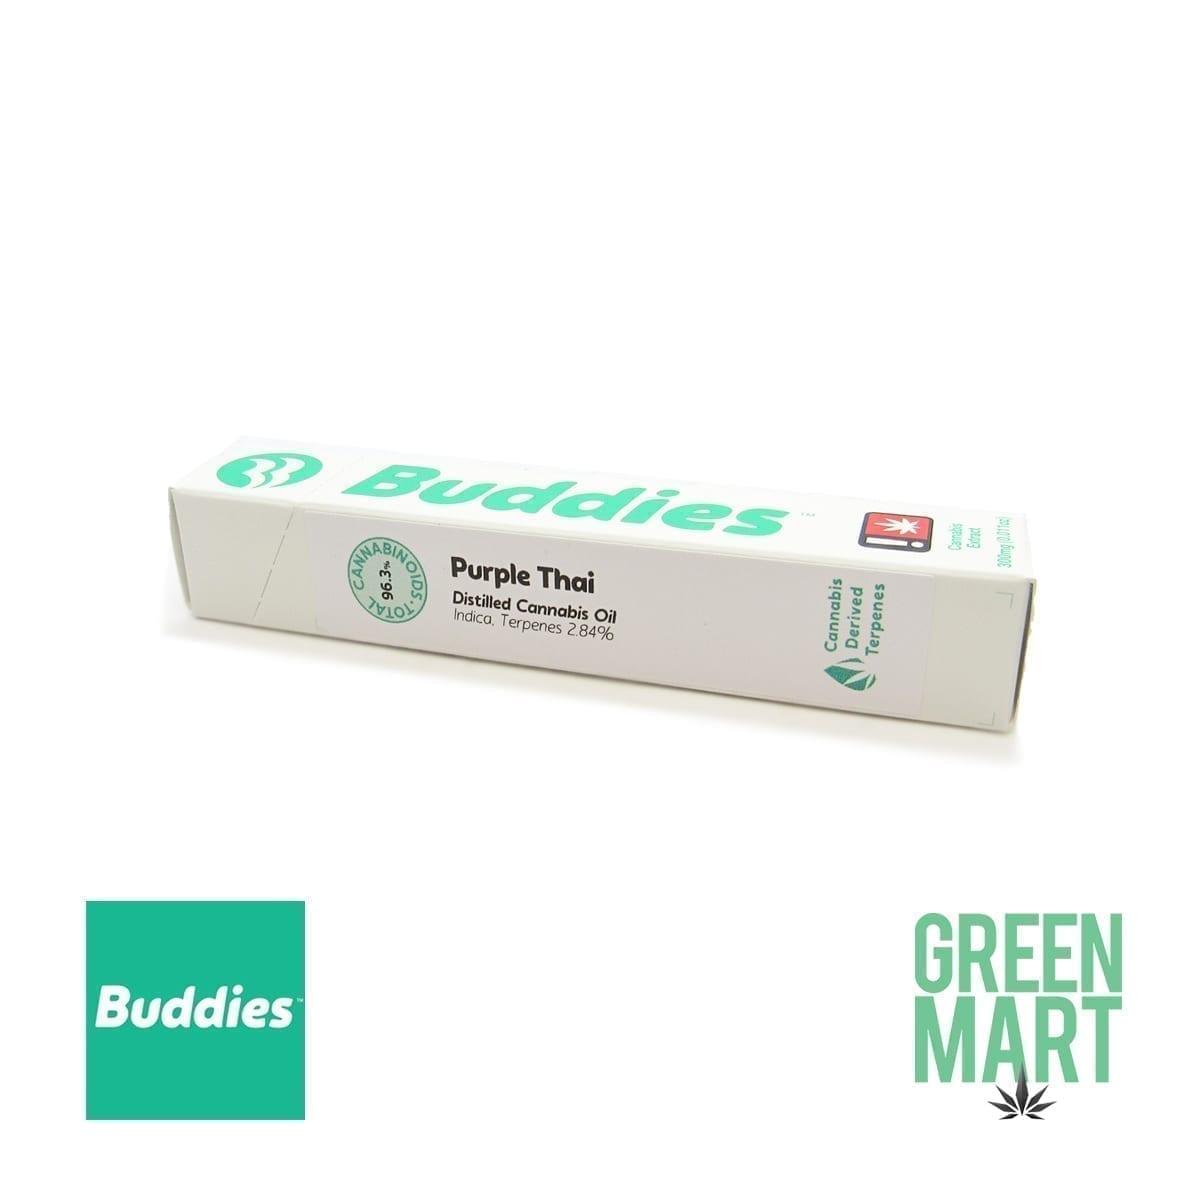 Buddies Brand Disposable Vape - Purple Thai